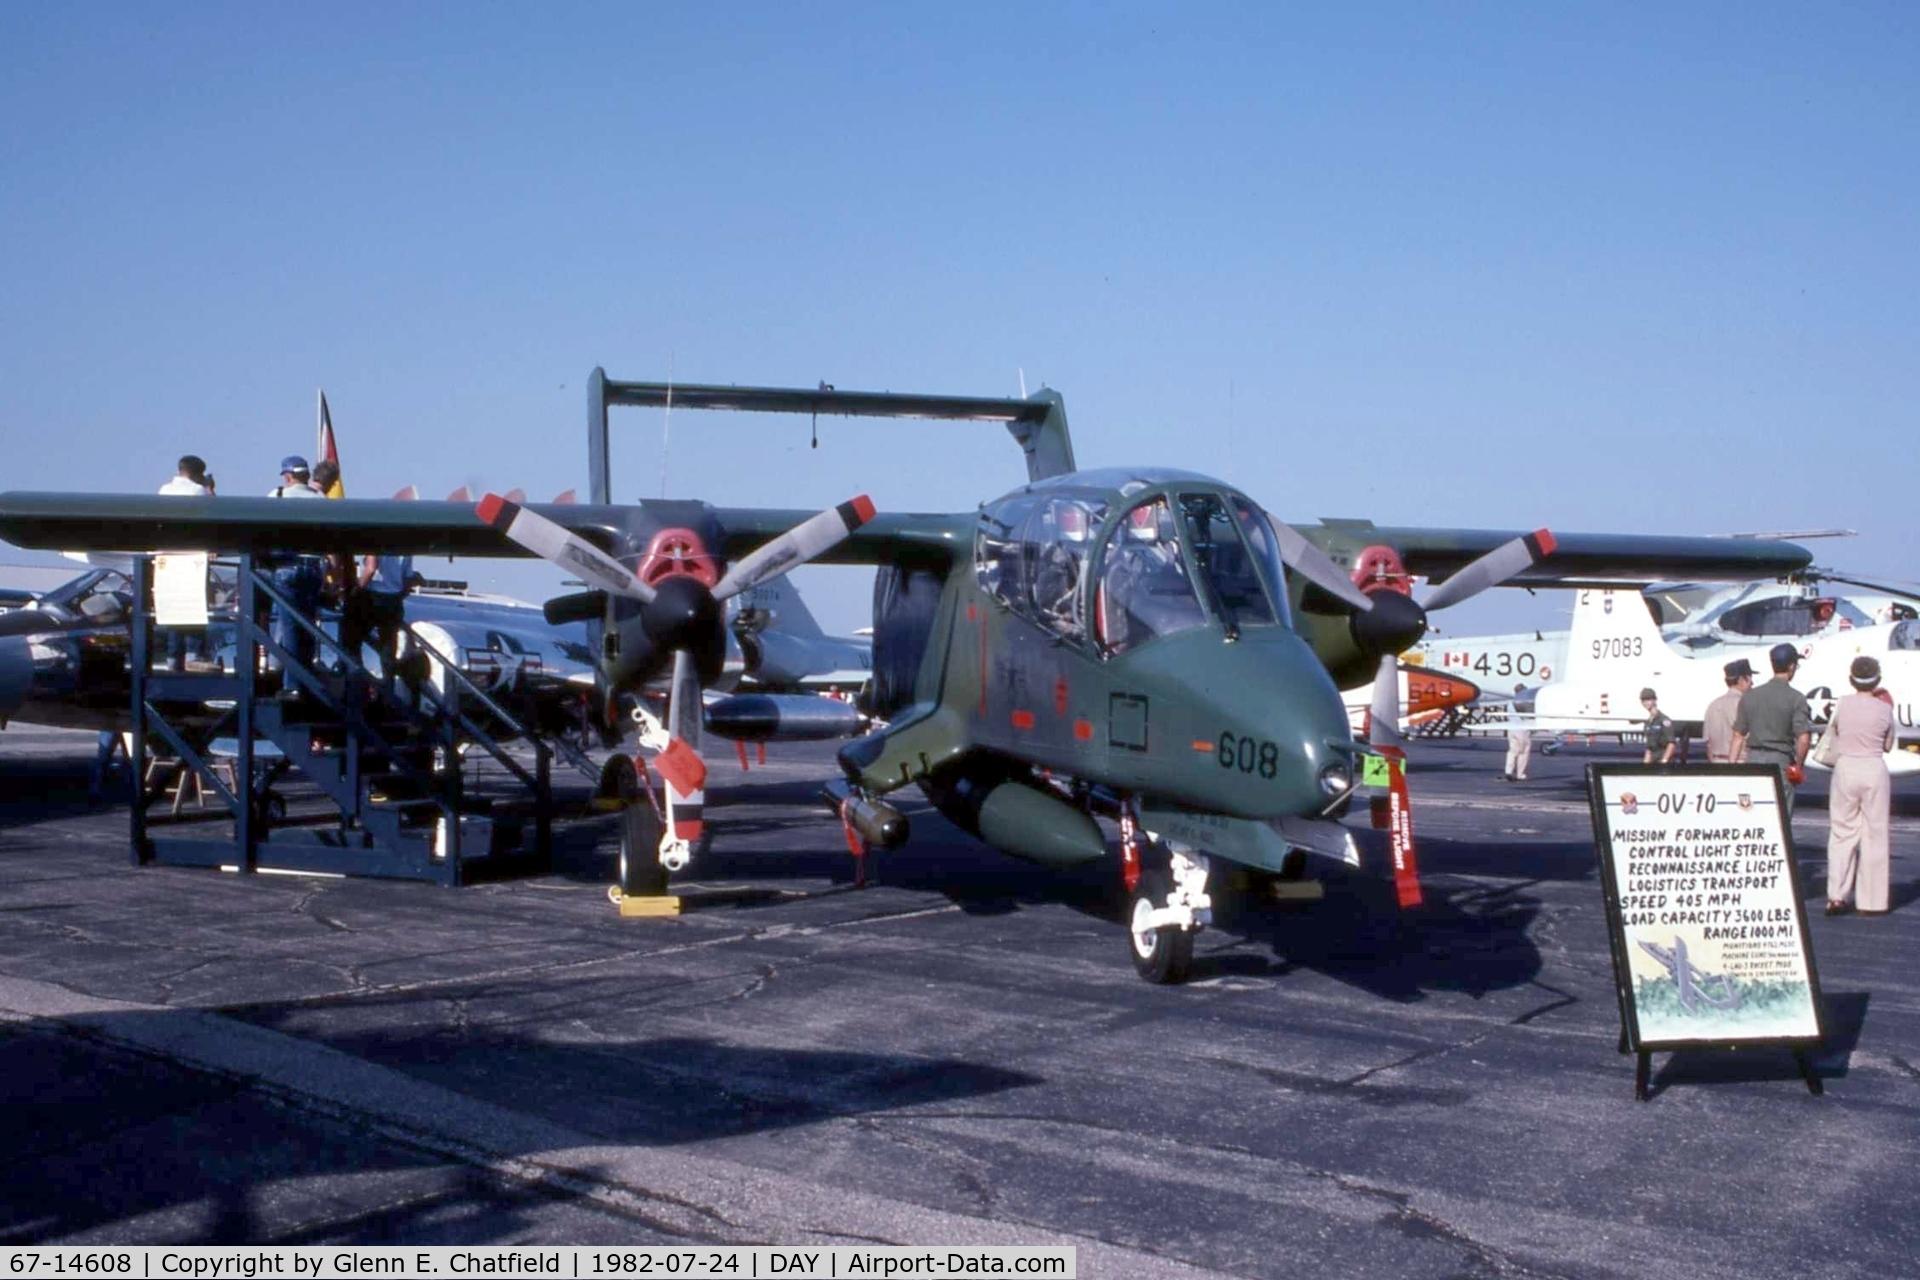 67-14608, 1967 North American Rockwell OV-10A Bronco C/N 305A-16,  At the Dayton International Air Show.